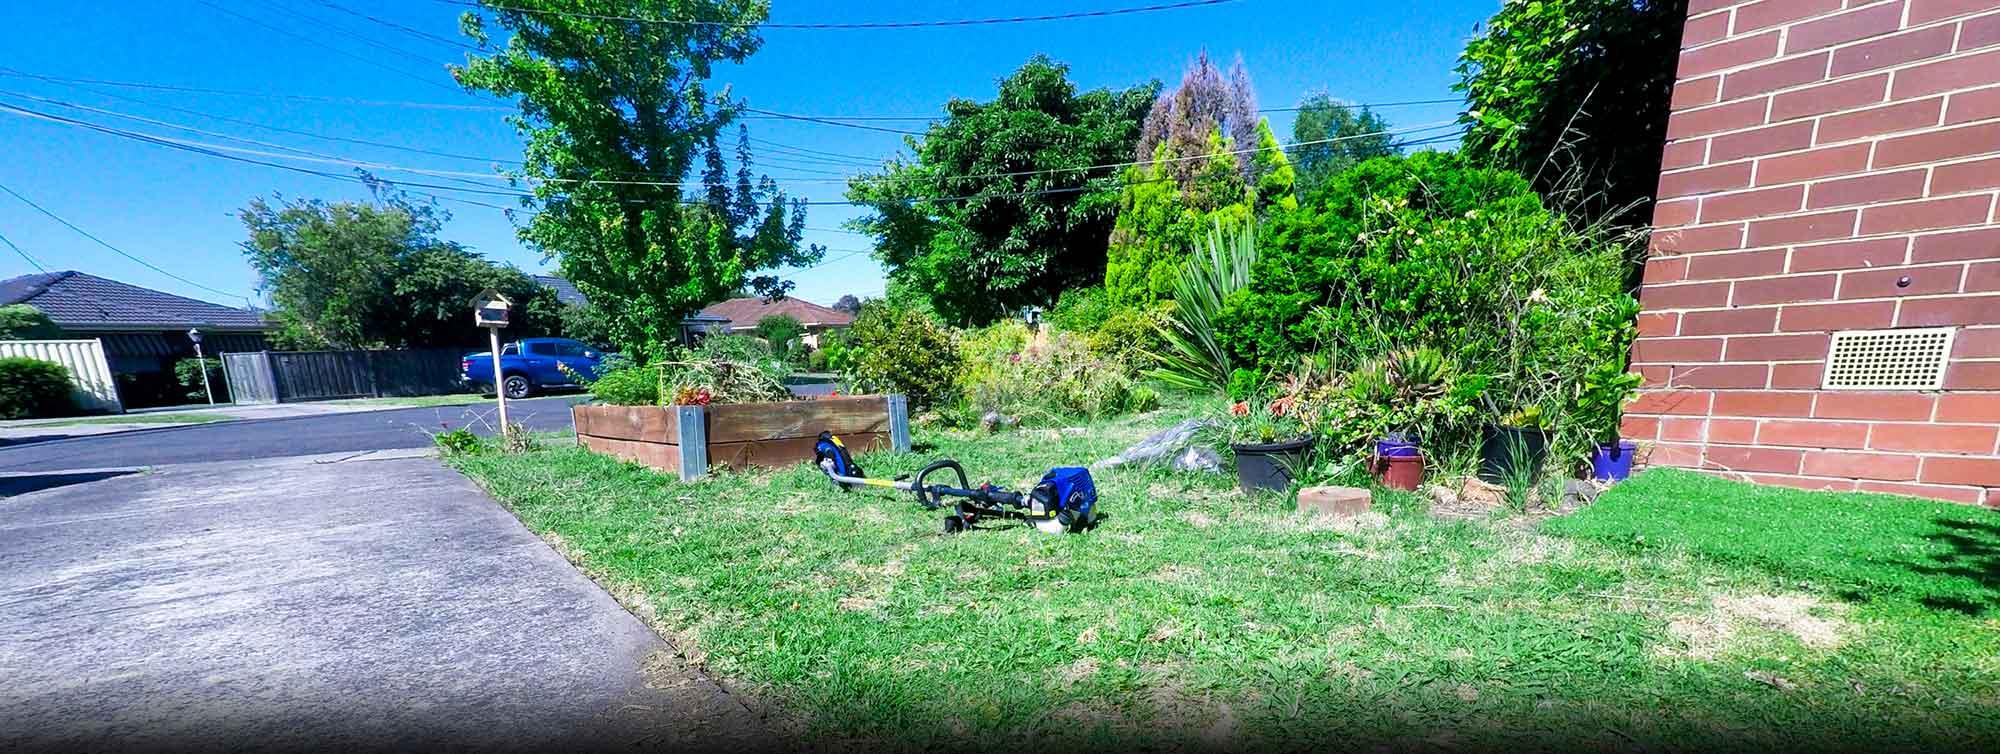 Lawn Edging Service Melbourne